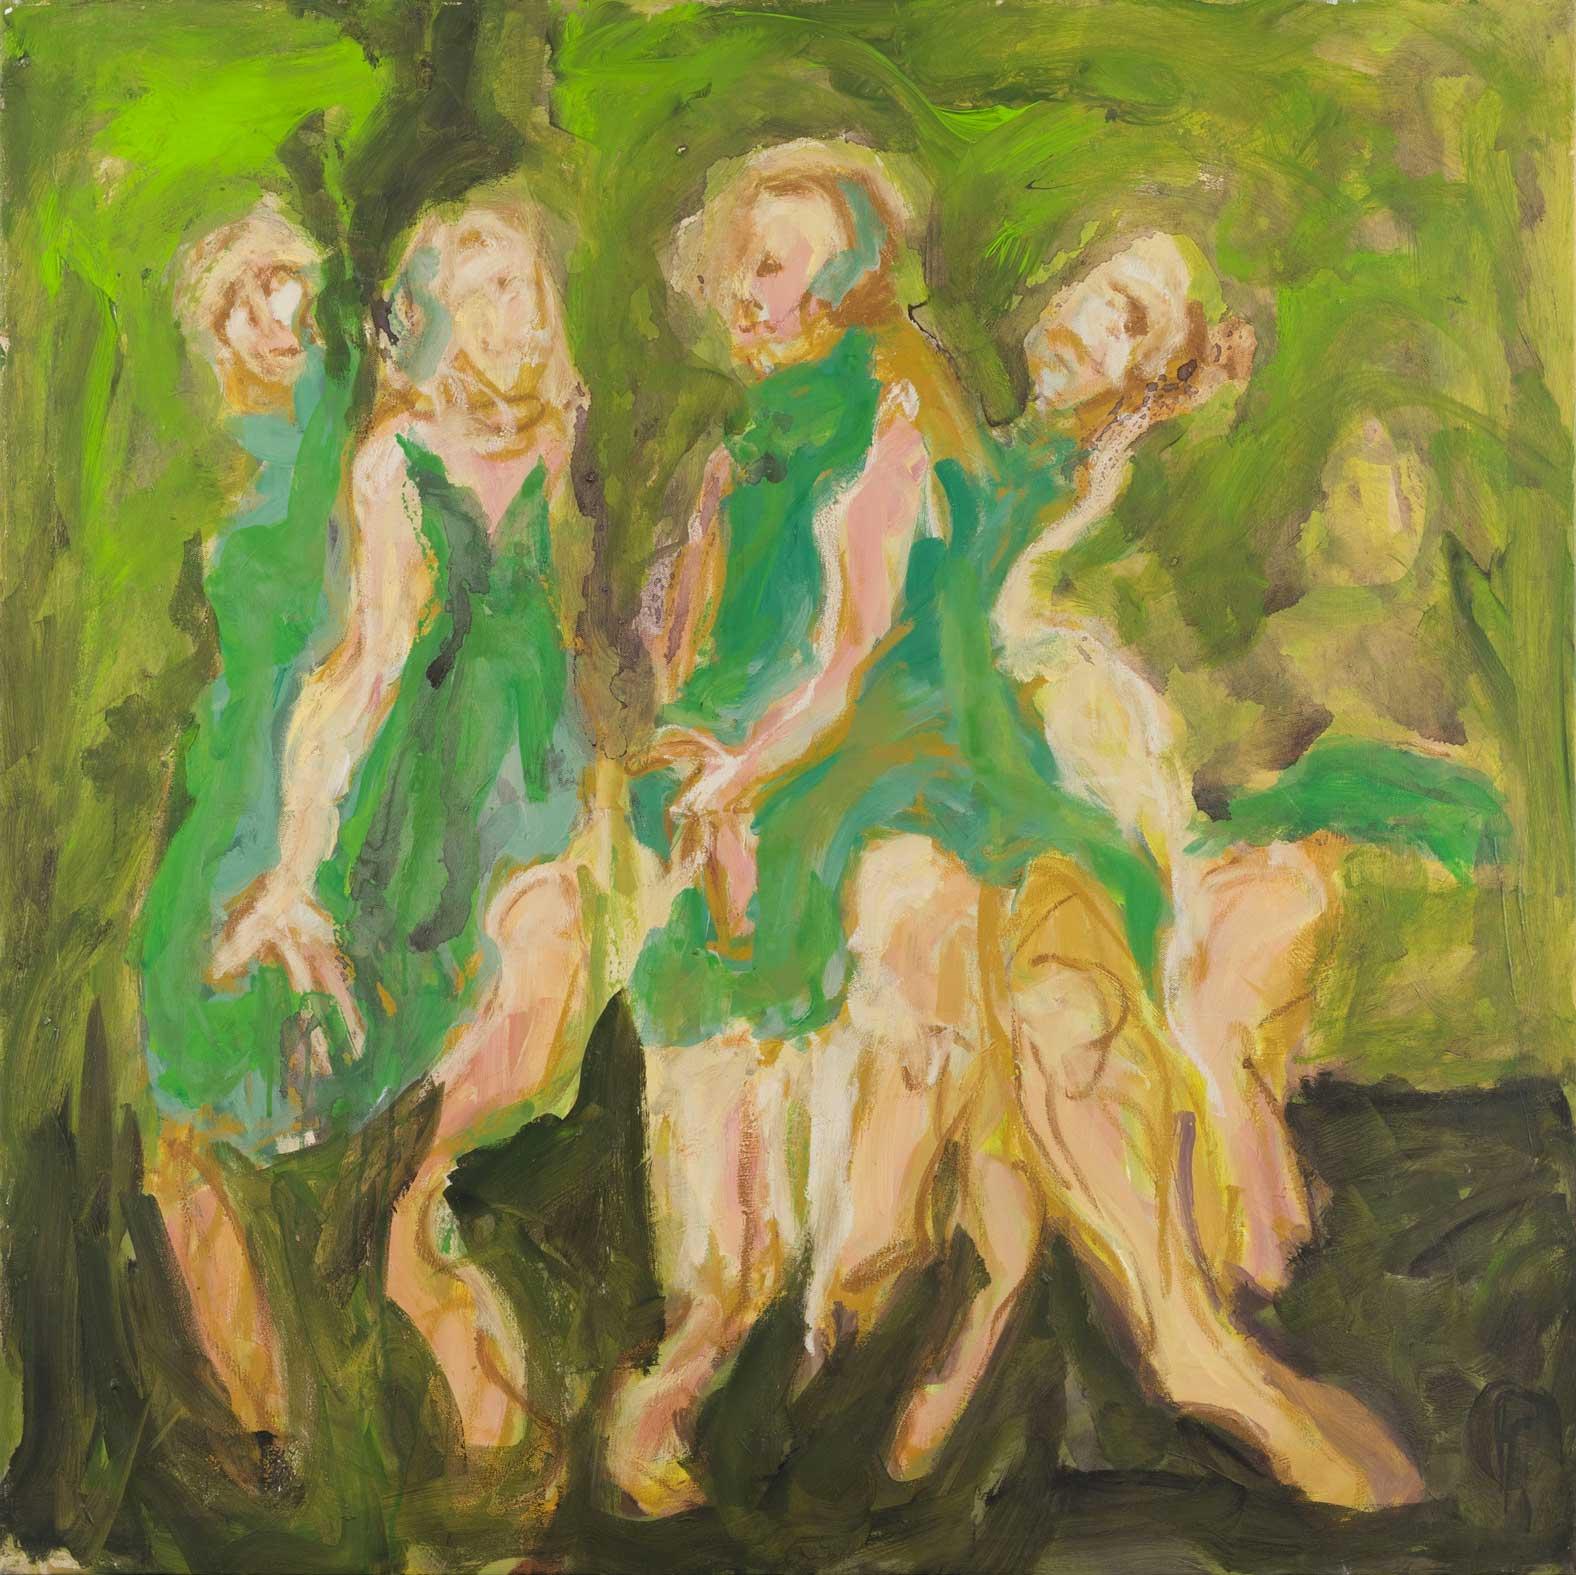 Symphonie en vert